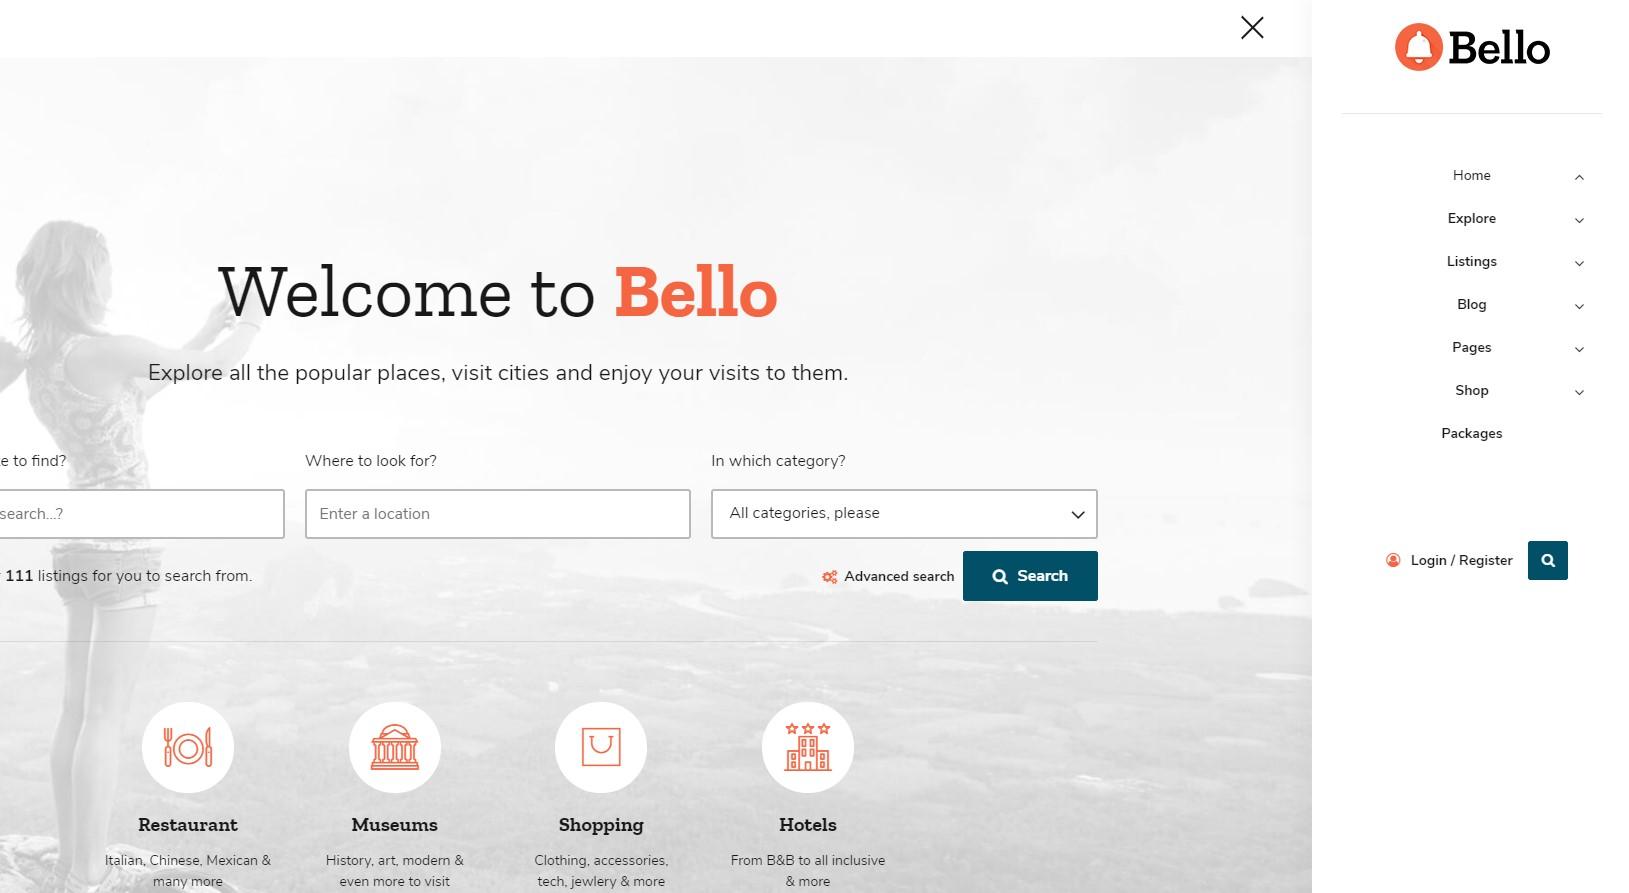 https://documentation.bold-themes.com/bello/wp-content/uploads/sites/31/2018/03/menu-vertical-right.jpg